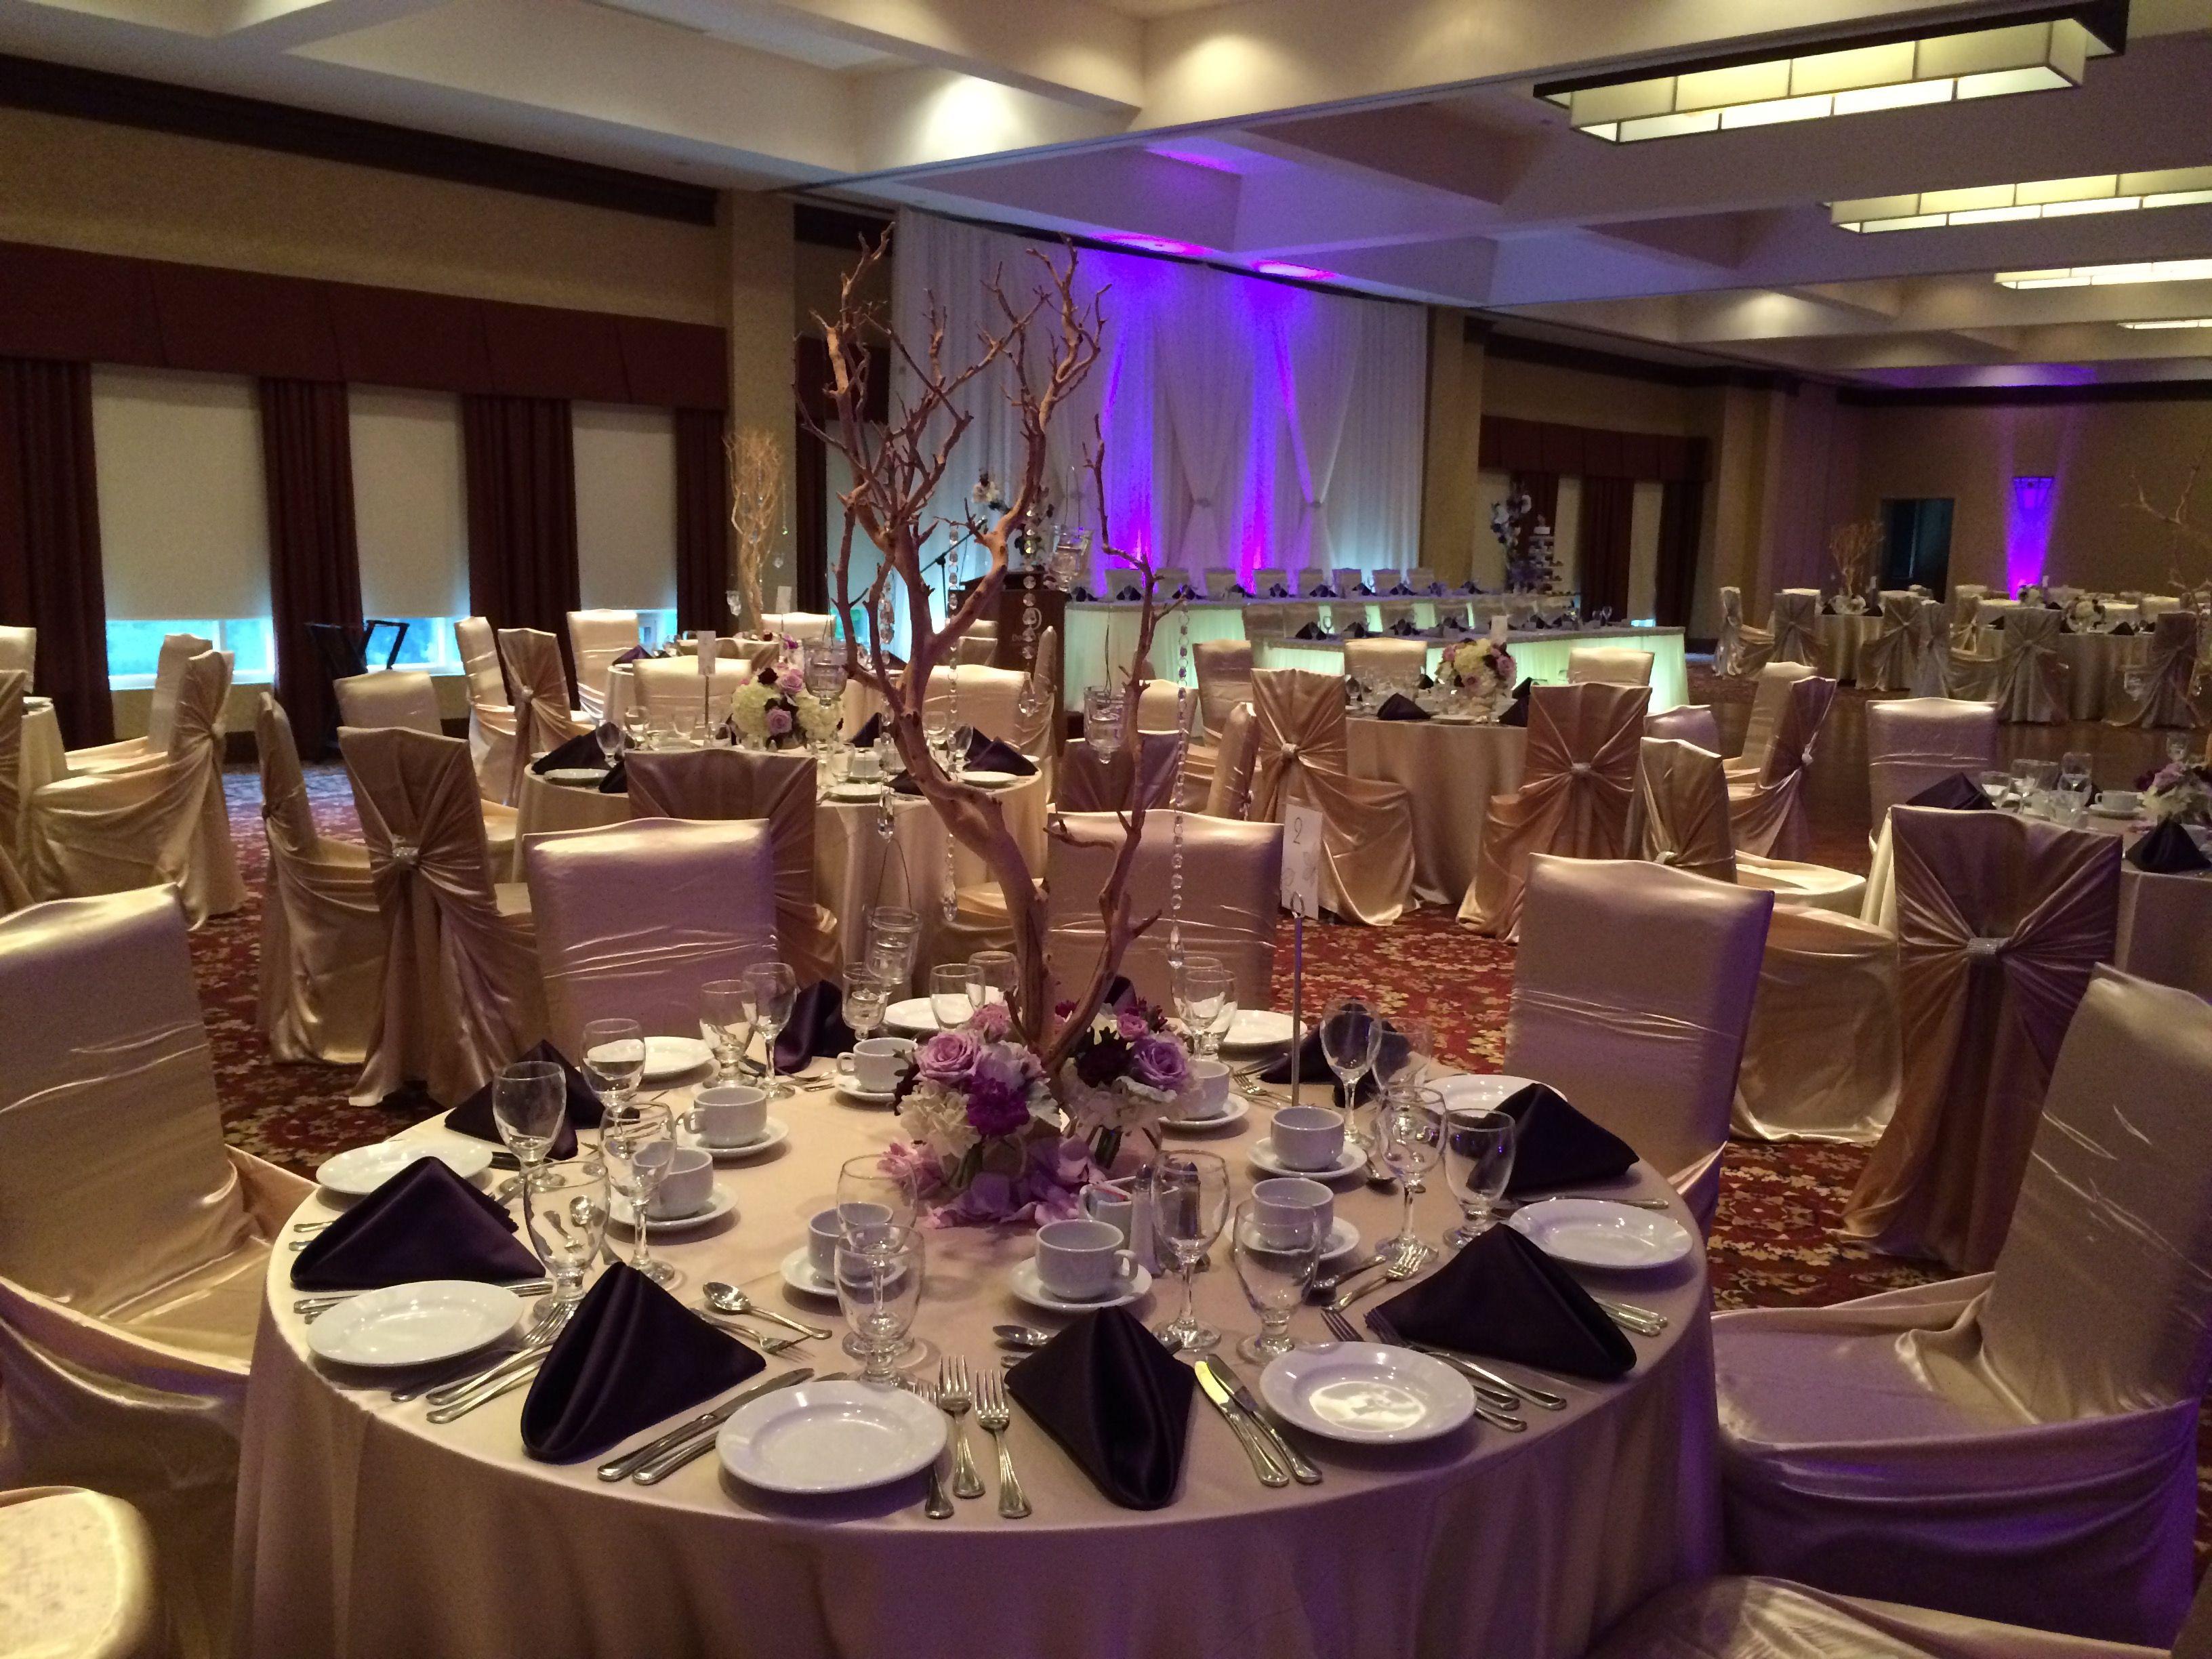 Niagara Wedding Venues Niagara Wedding Helper Wedding Directory Wedding Reception Hall Wedding Helpers Niagara Wedding